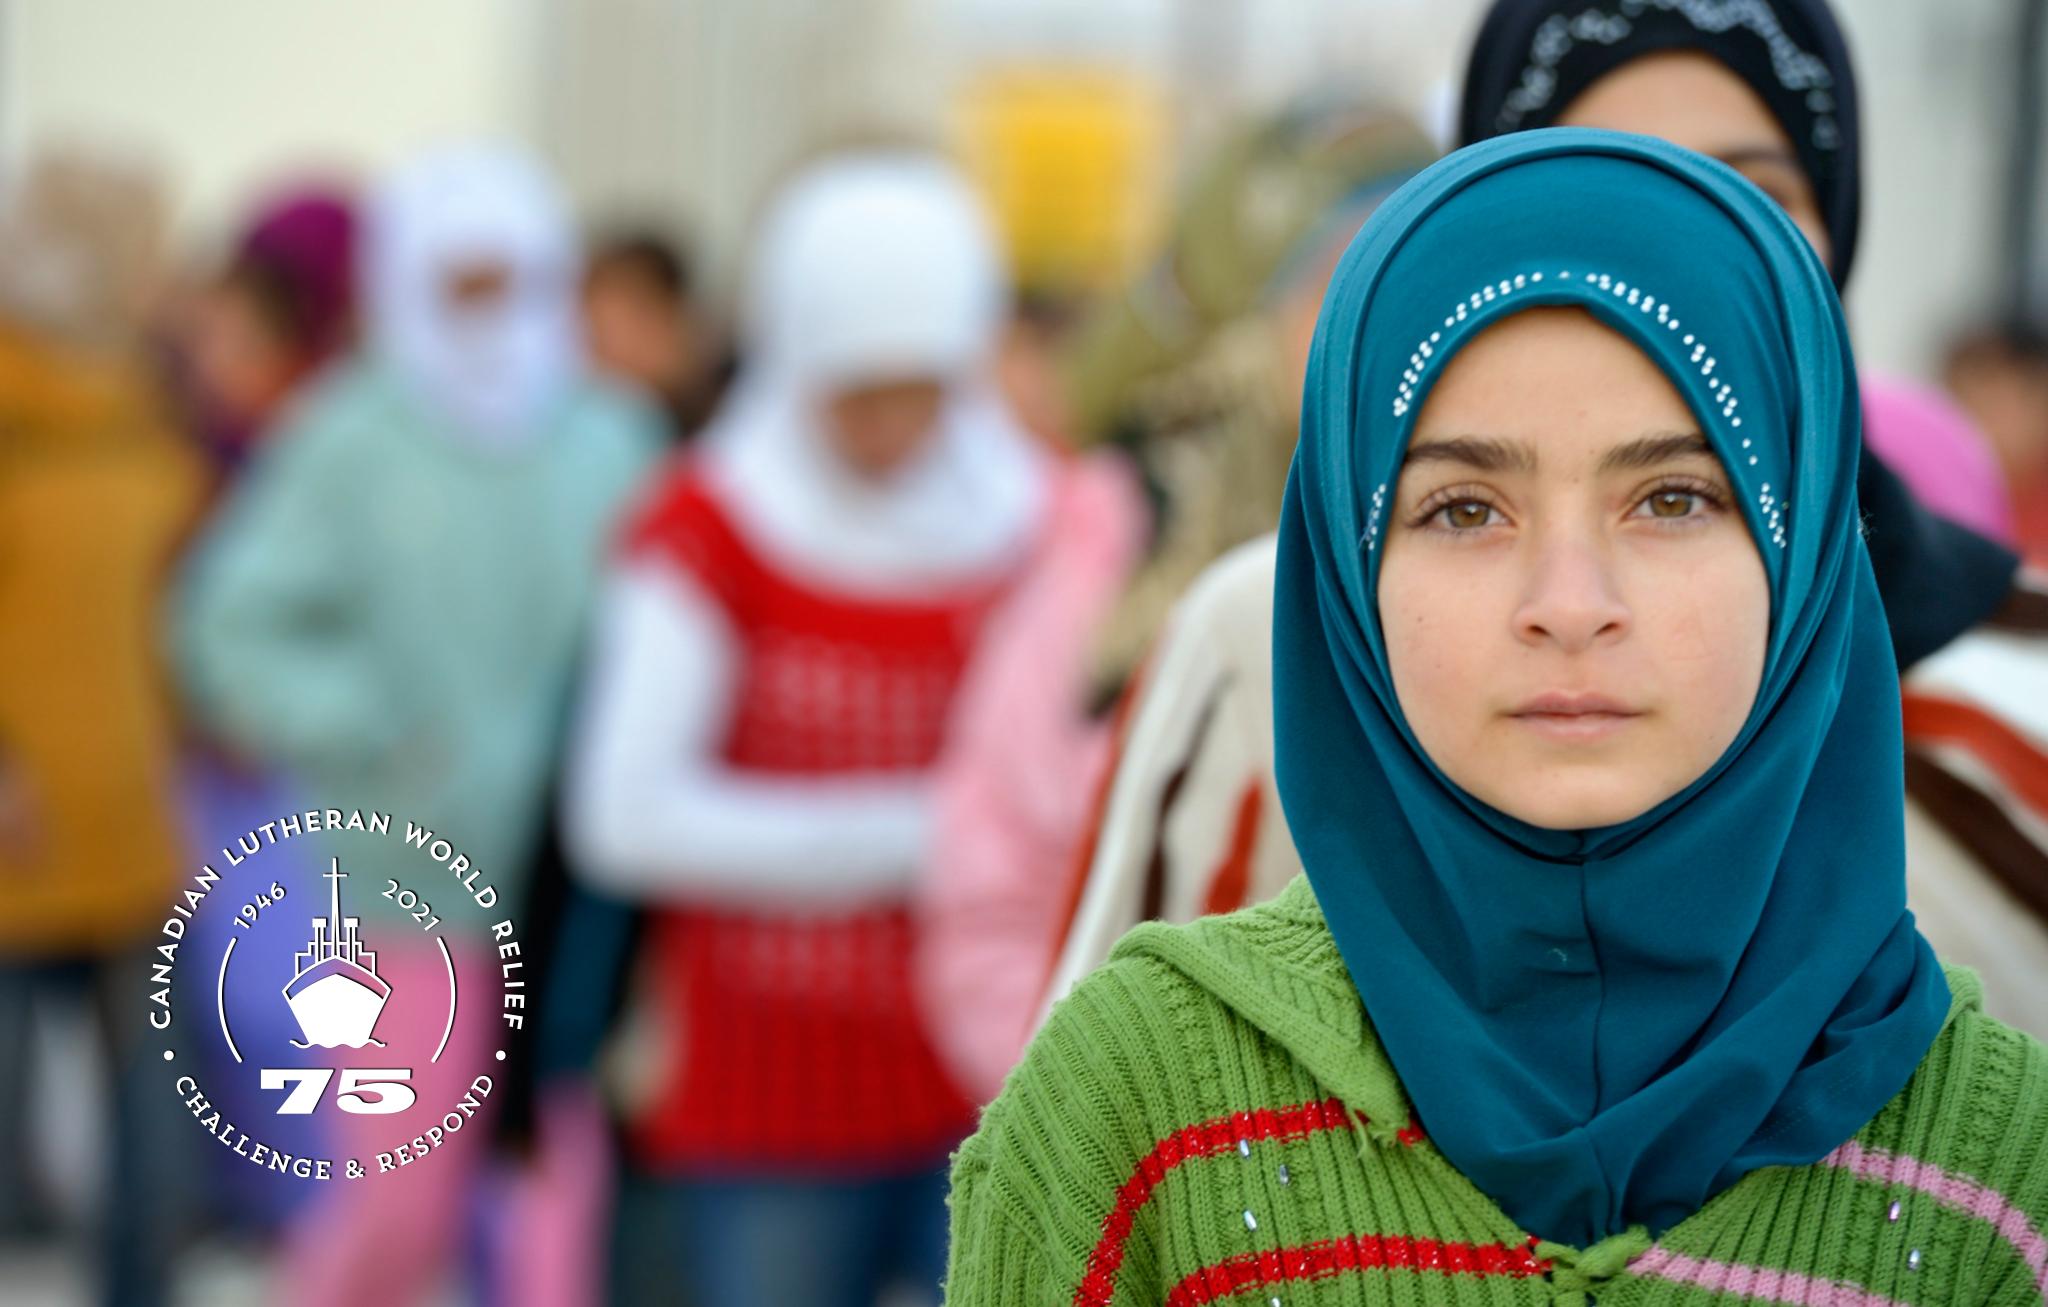 Photo of a girl in line before starting school in the Zaatari Refugee Camp, Jordan